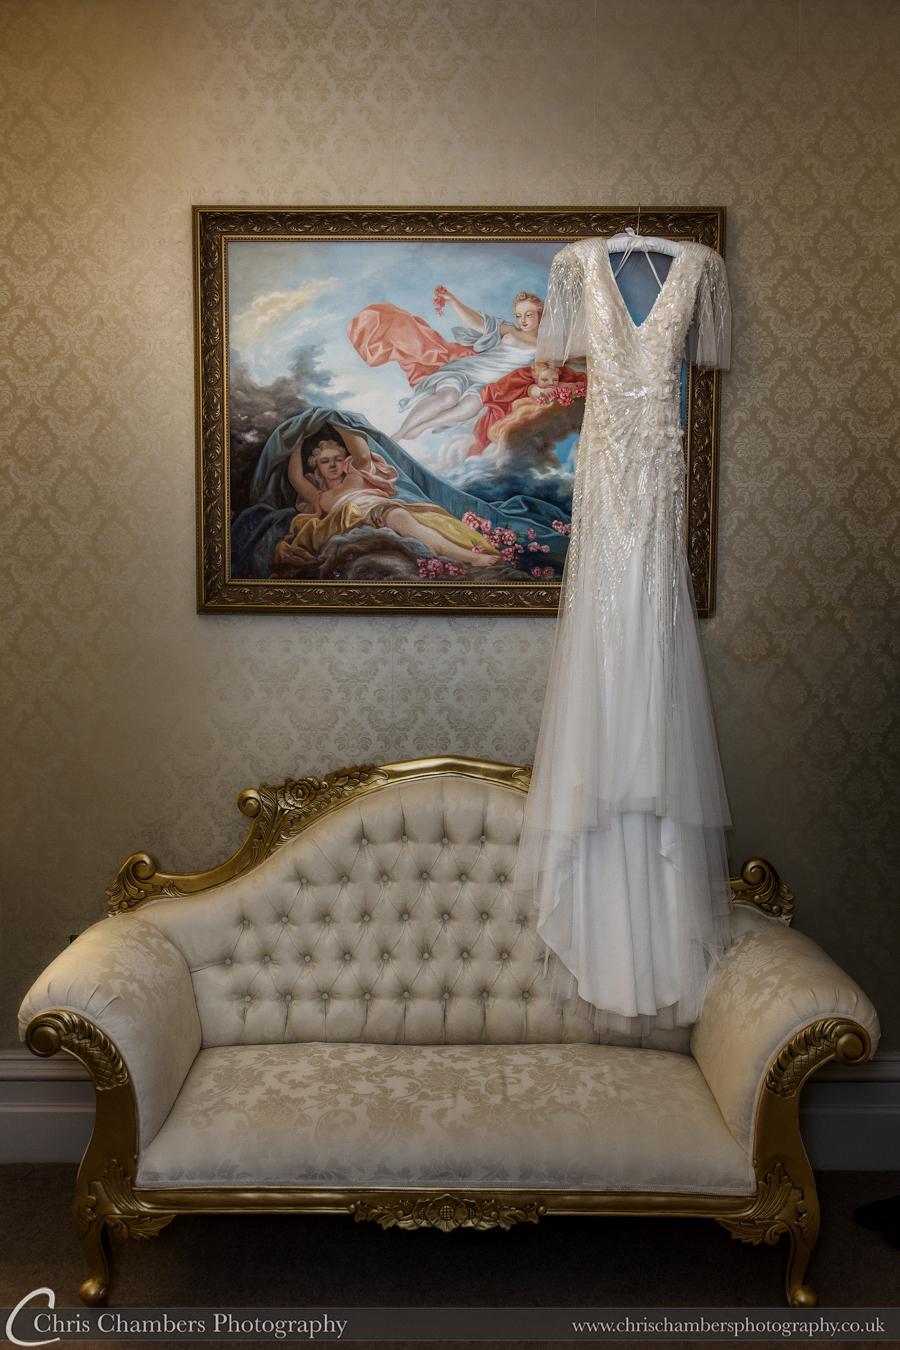 Rossington Hall wedding photographer, Chris Chambers Photography, Award winning wedding photographer